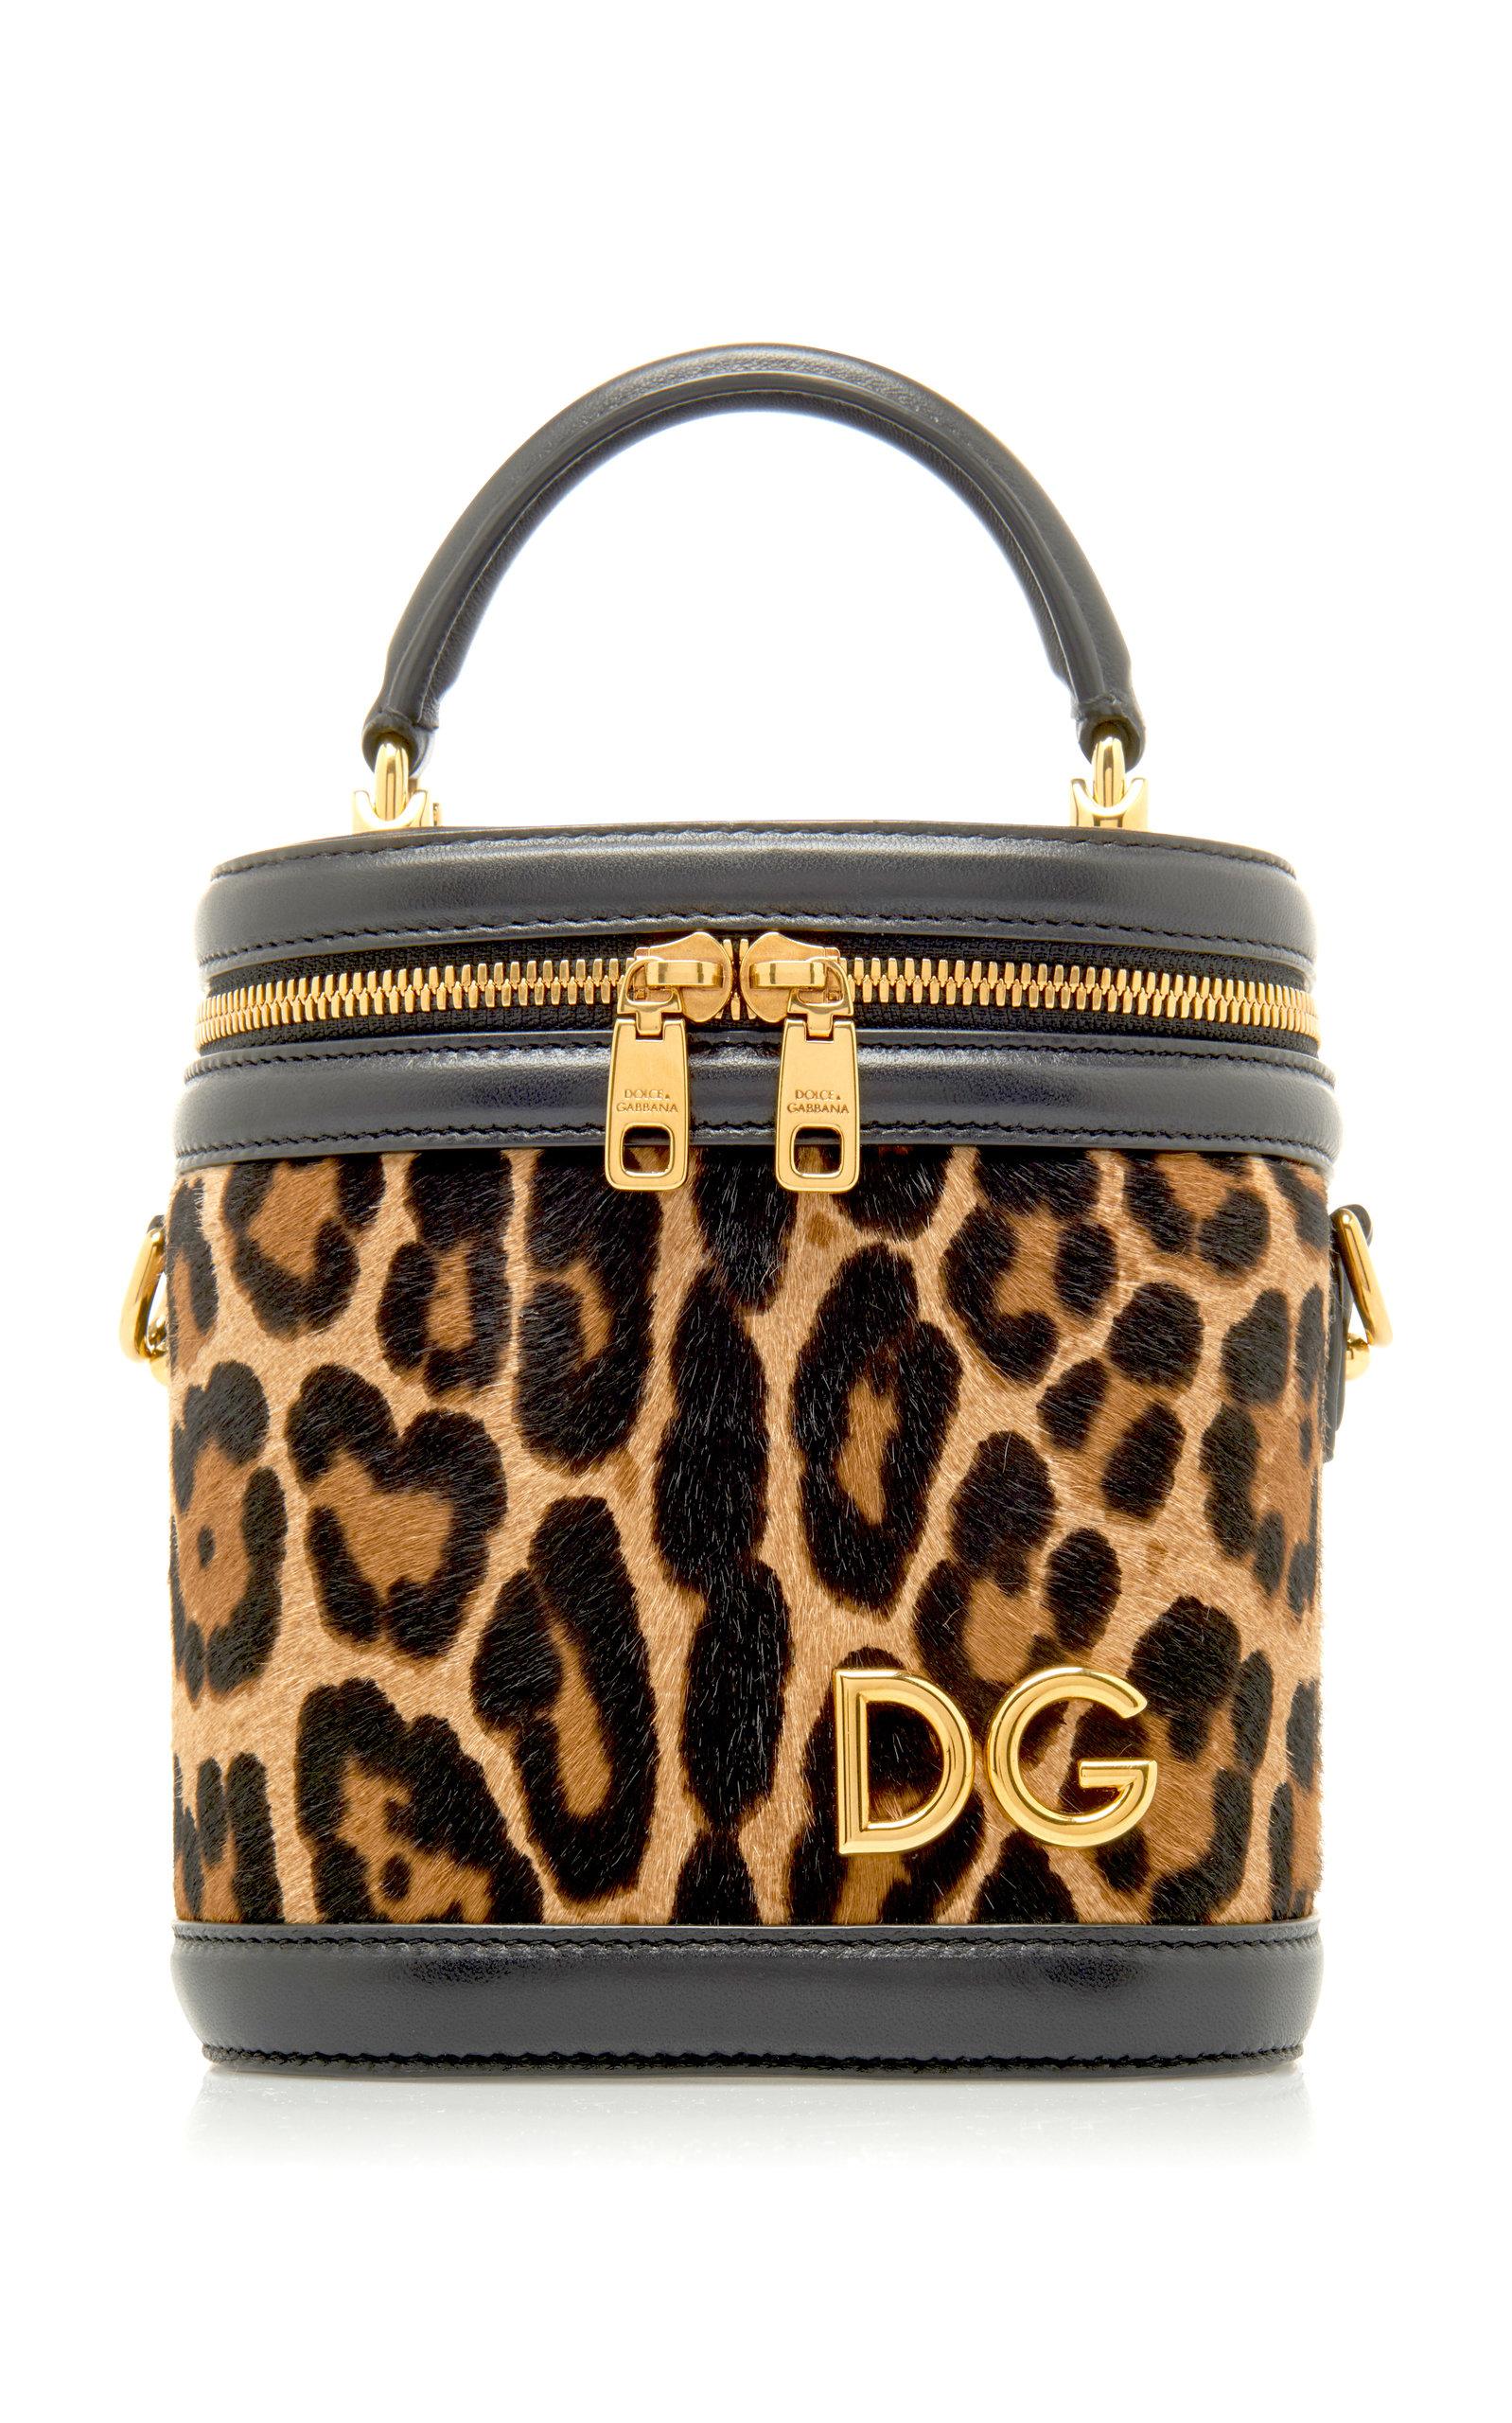 5b6bdeae91 Dolce   Gabbana Leather-Trimmed Leopard Print Bucket Bag